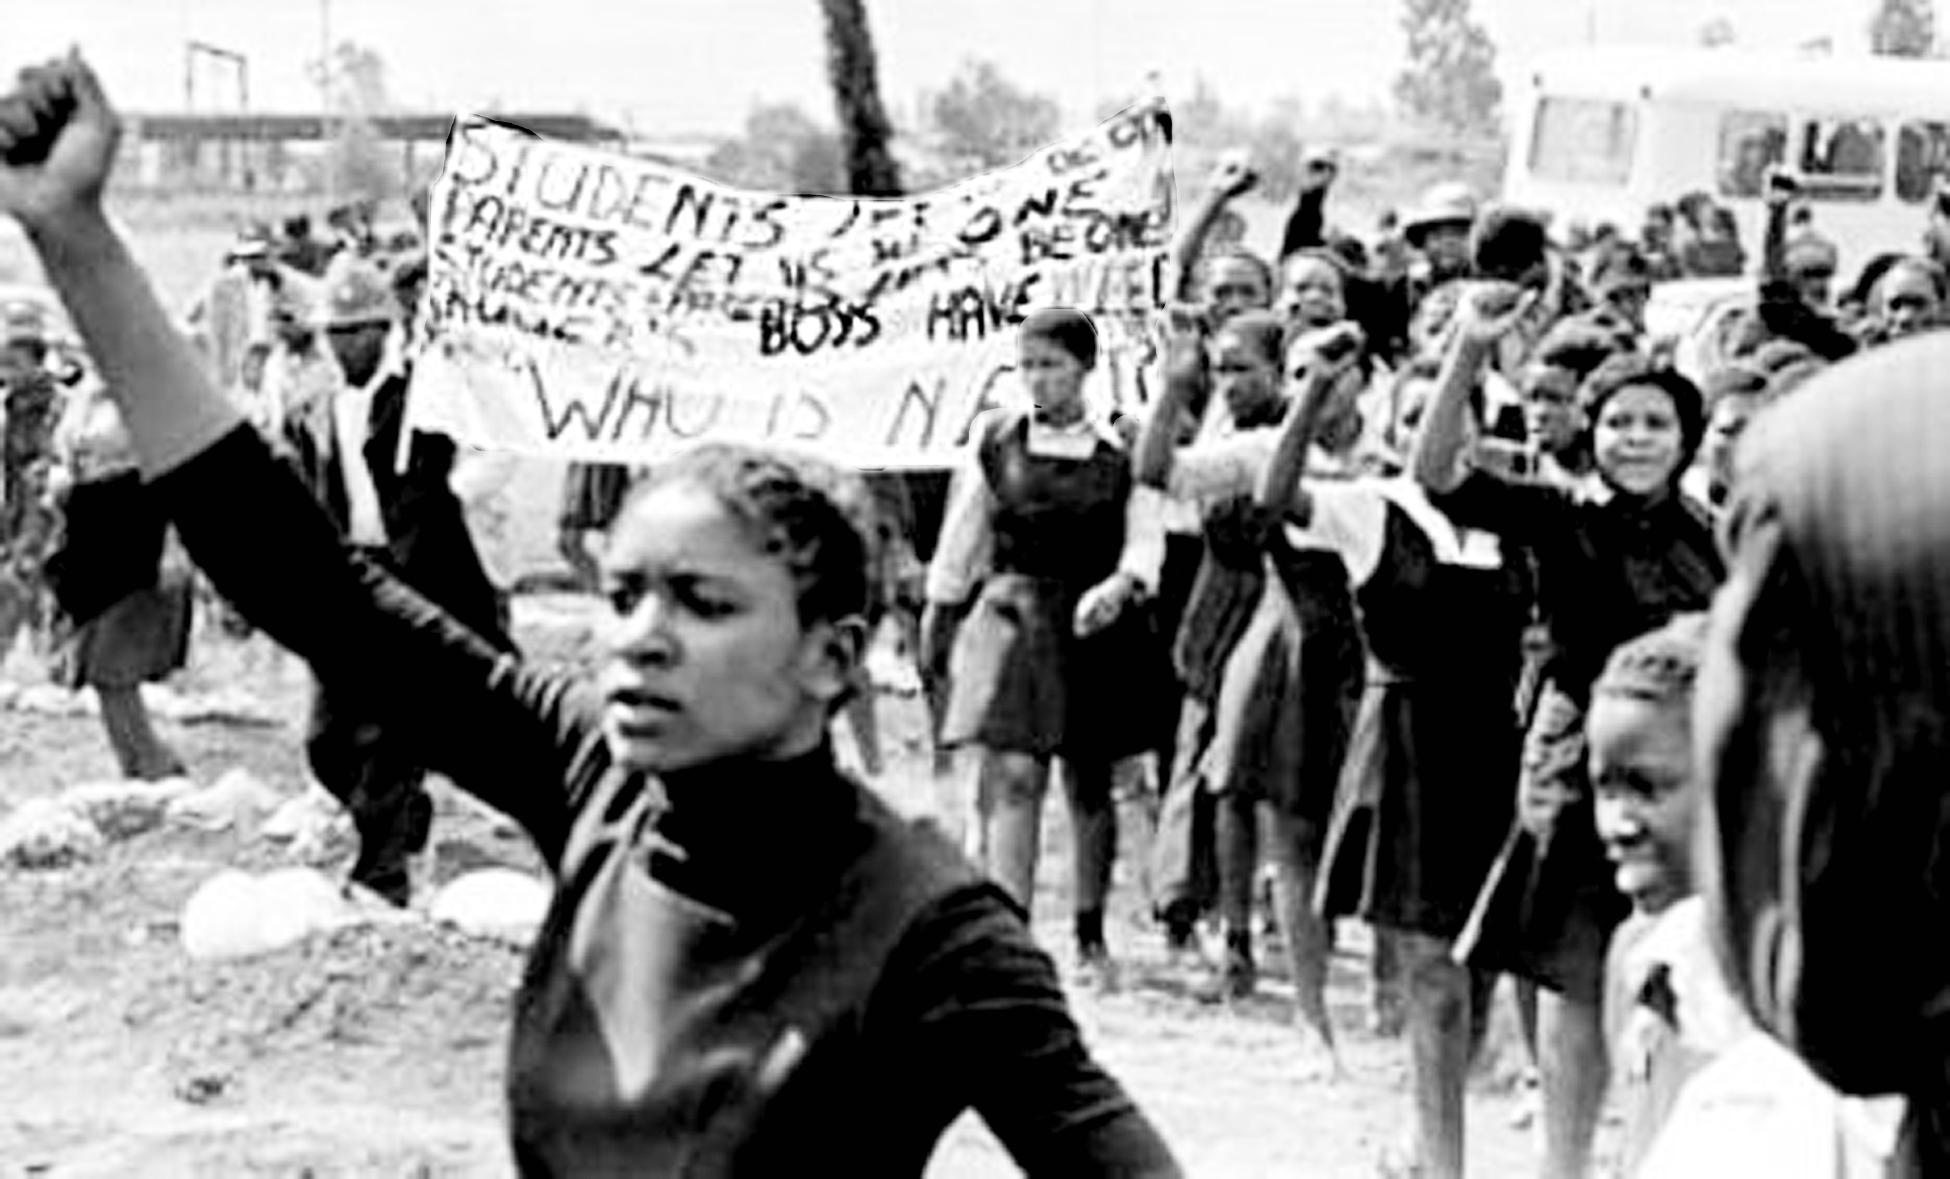 https://socialistaction.org/wp-content/uploads/2016/06/july-2016-soweto.jpg